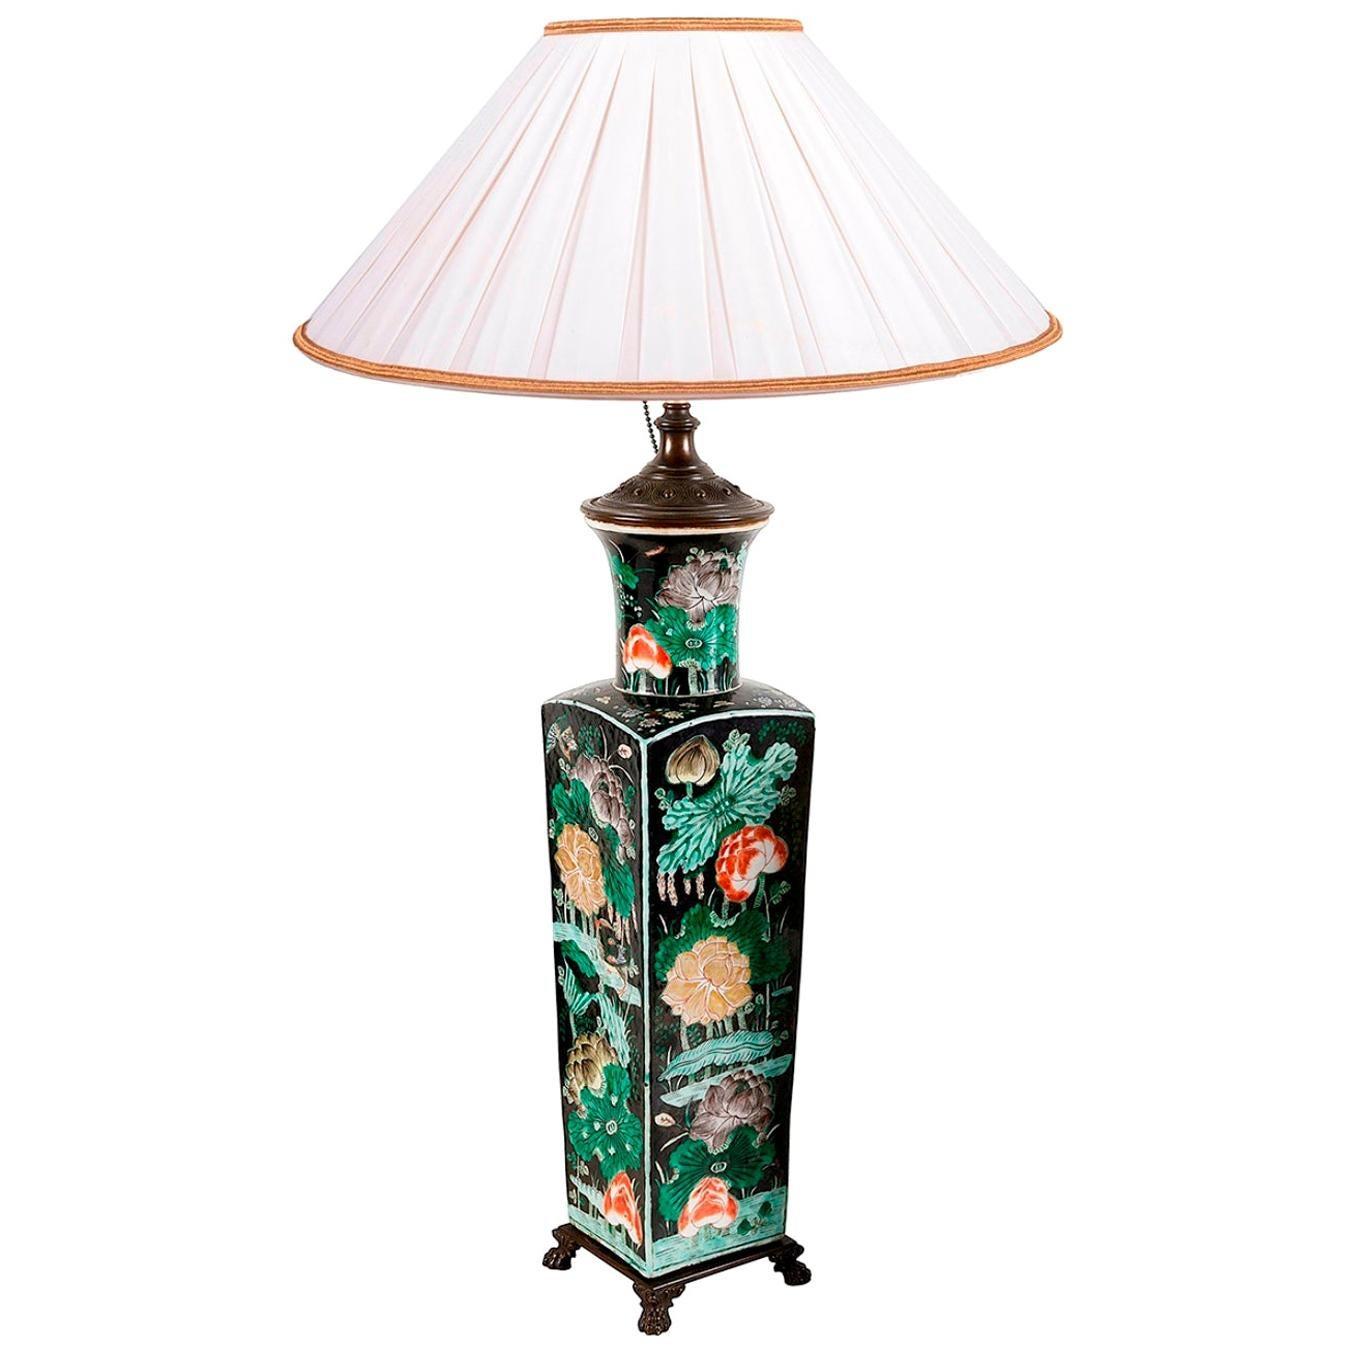 19th Century Chinese Famille Noire Porcelain Vase / Lamp